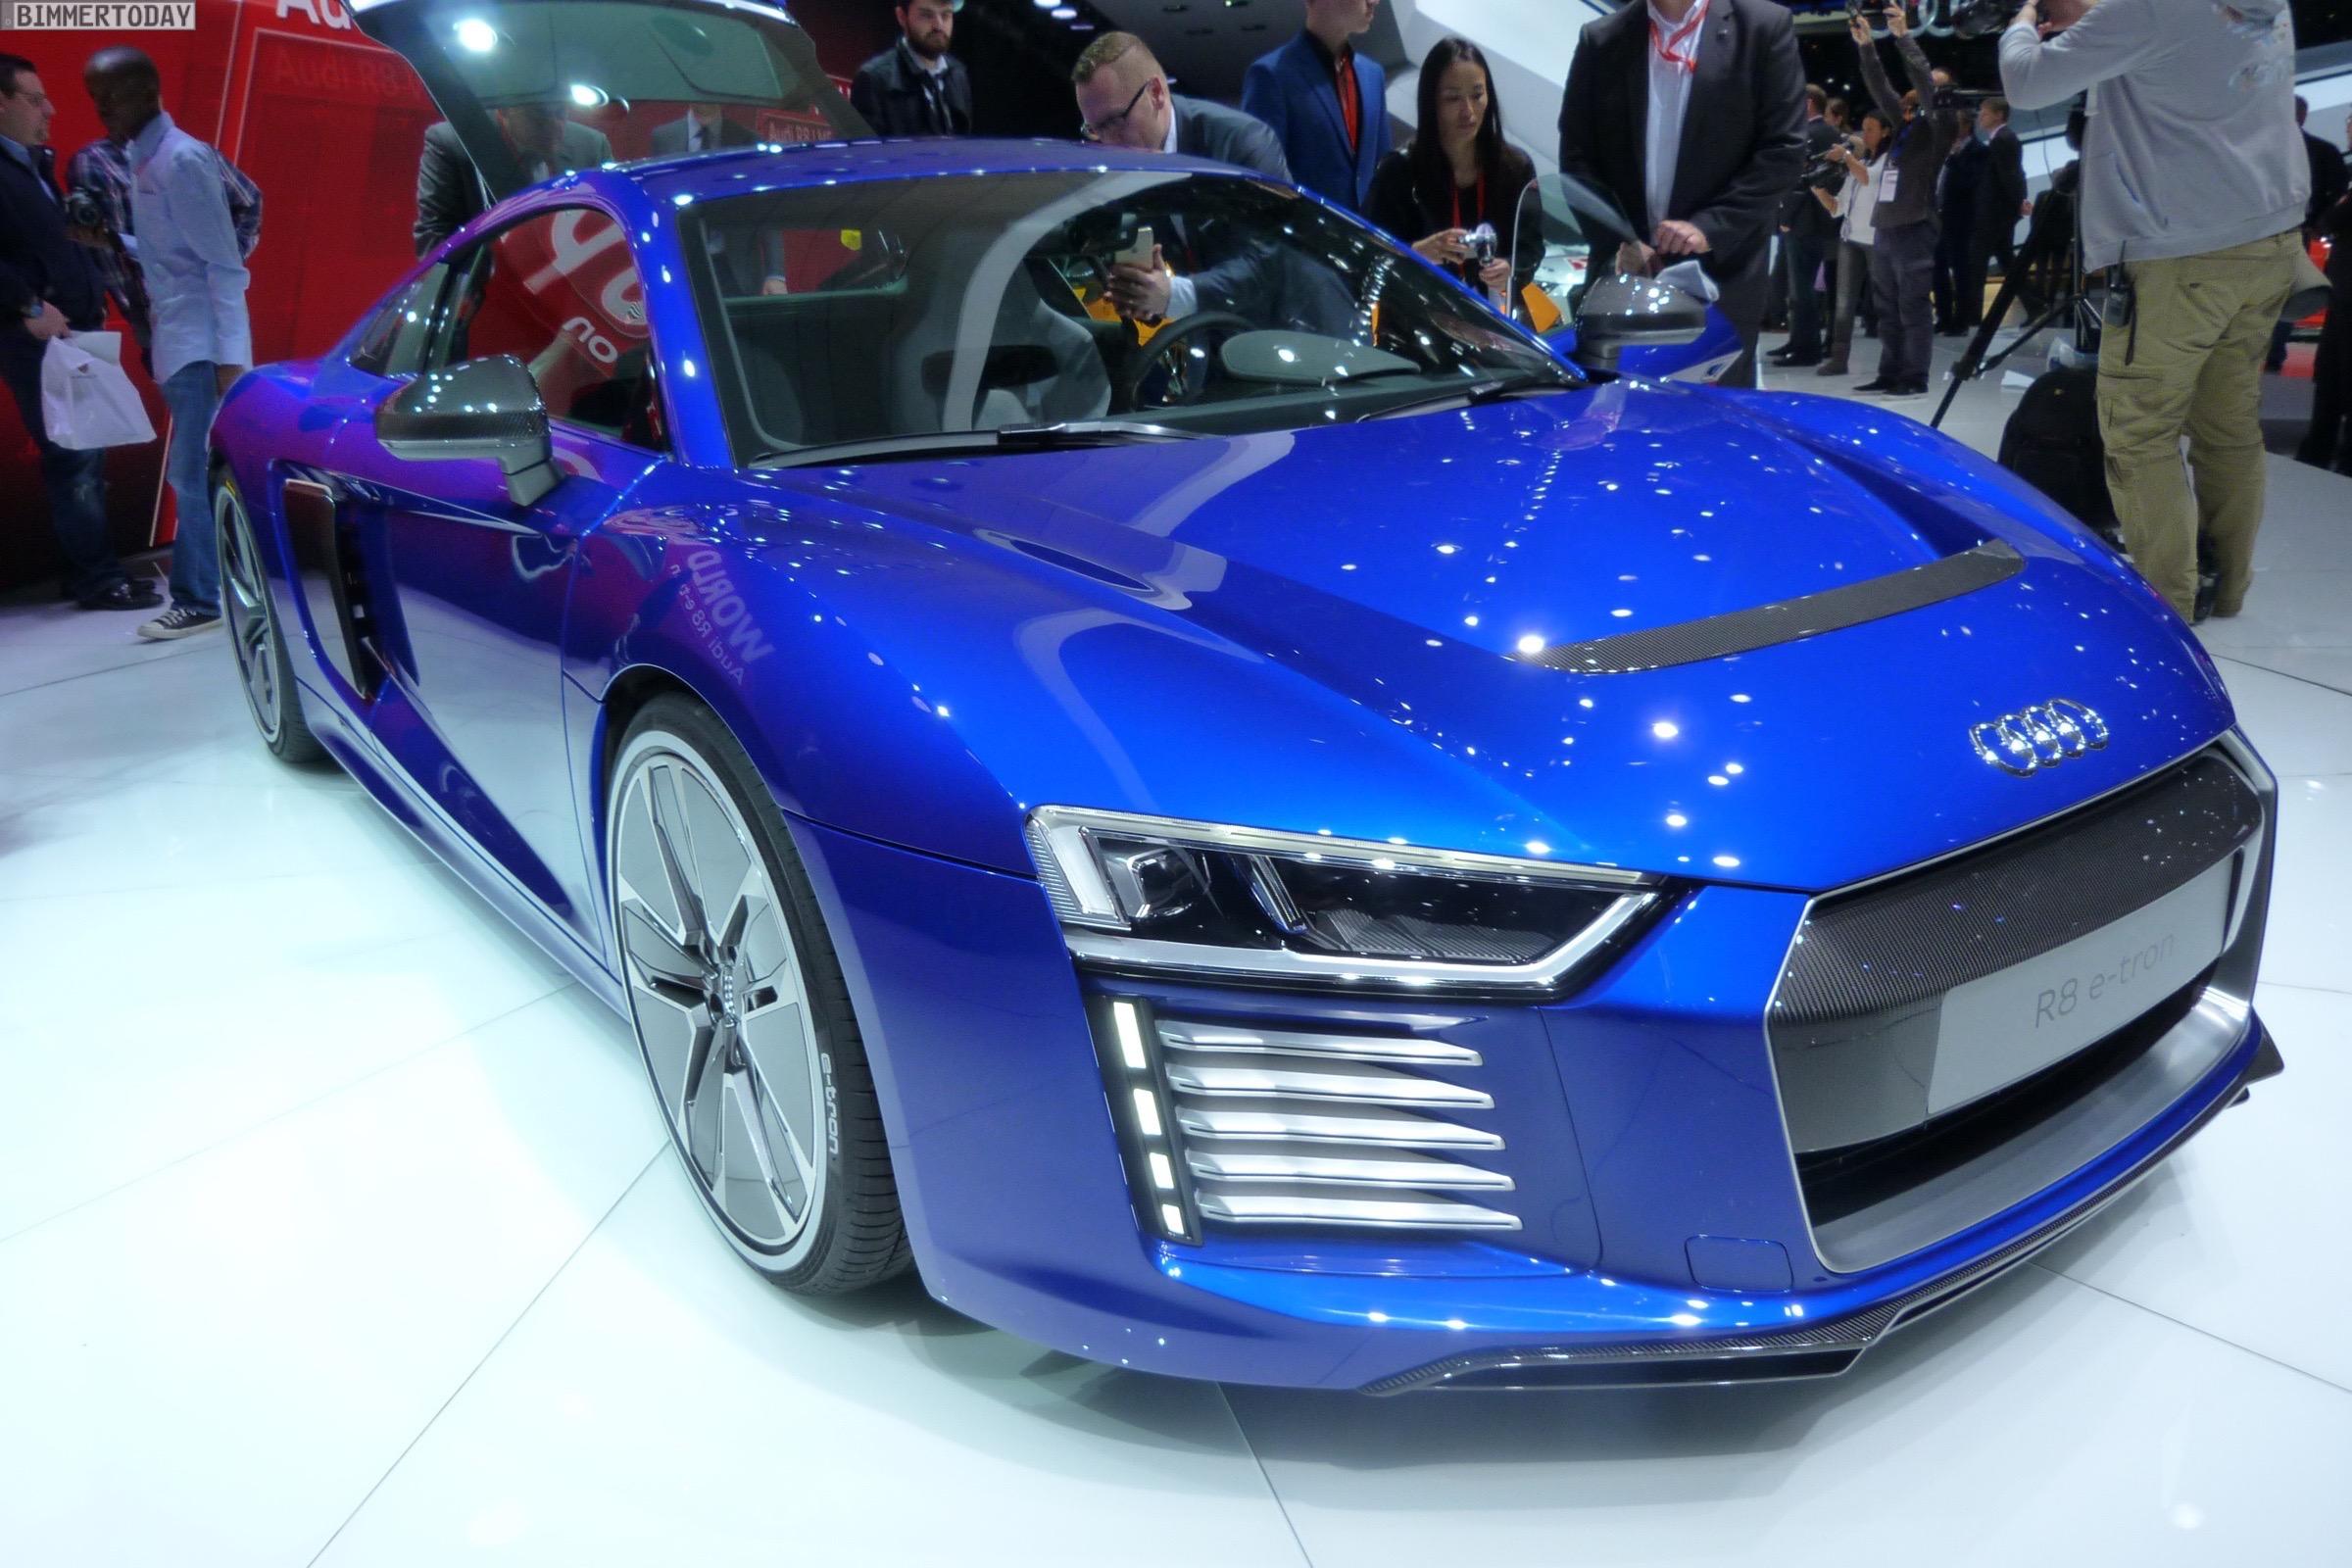 Audi R8 e tron 2015 Genf Autosalon Live 14